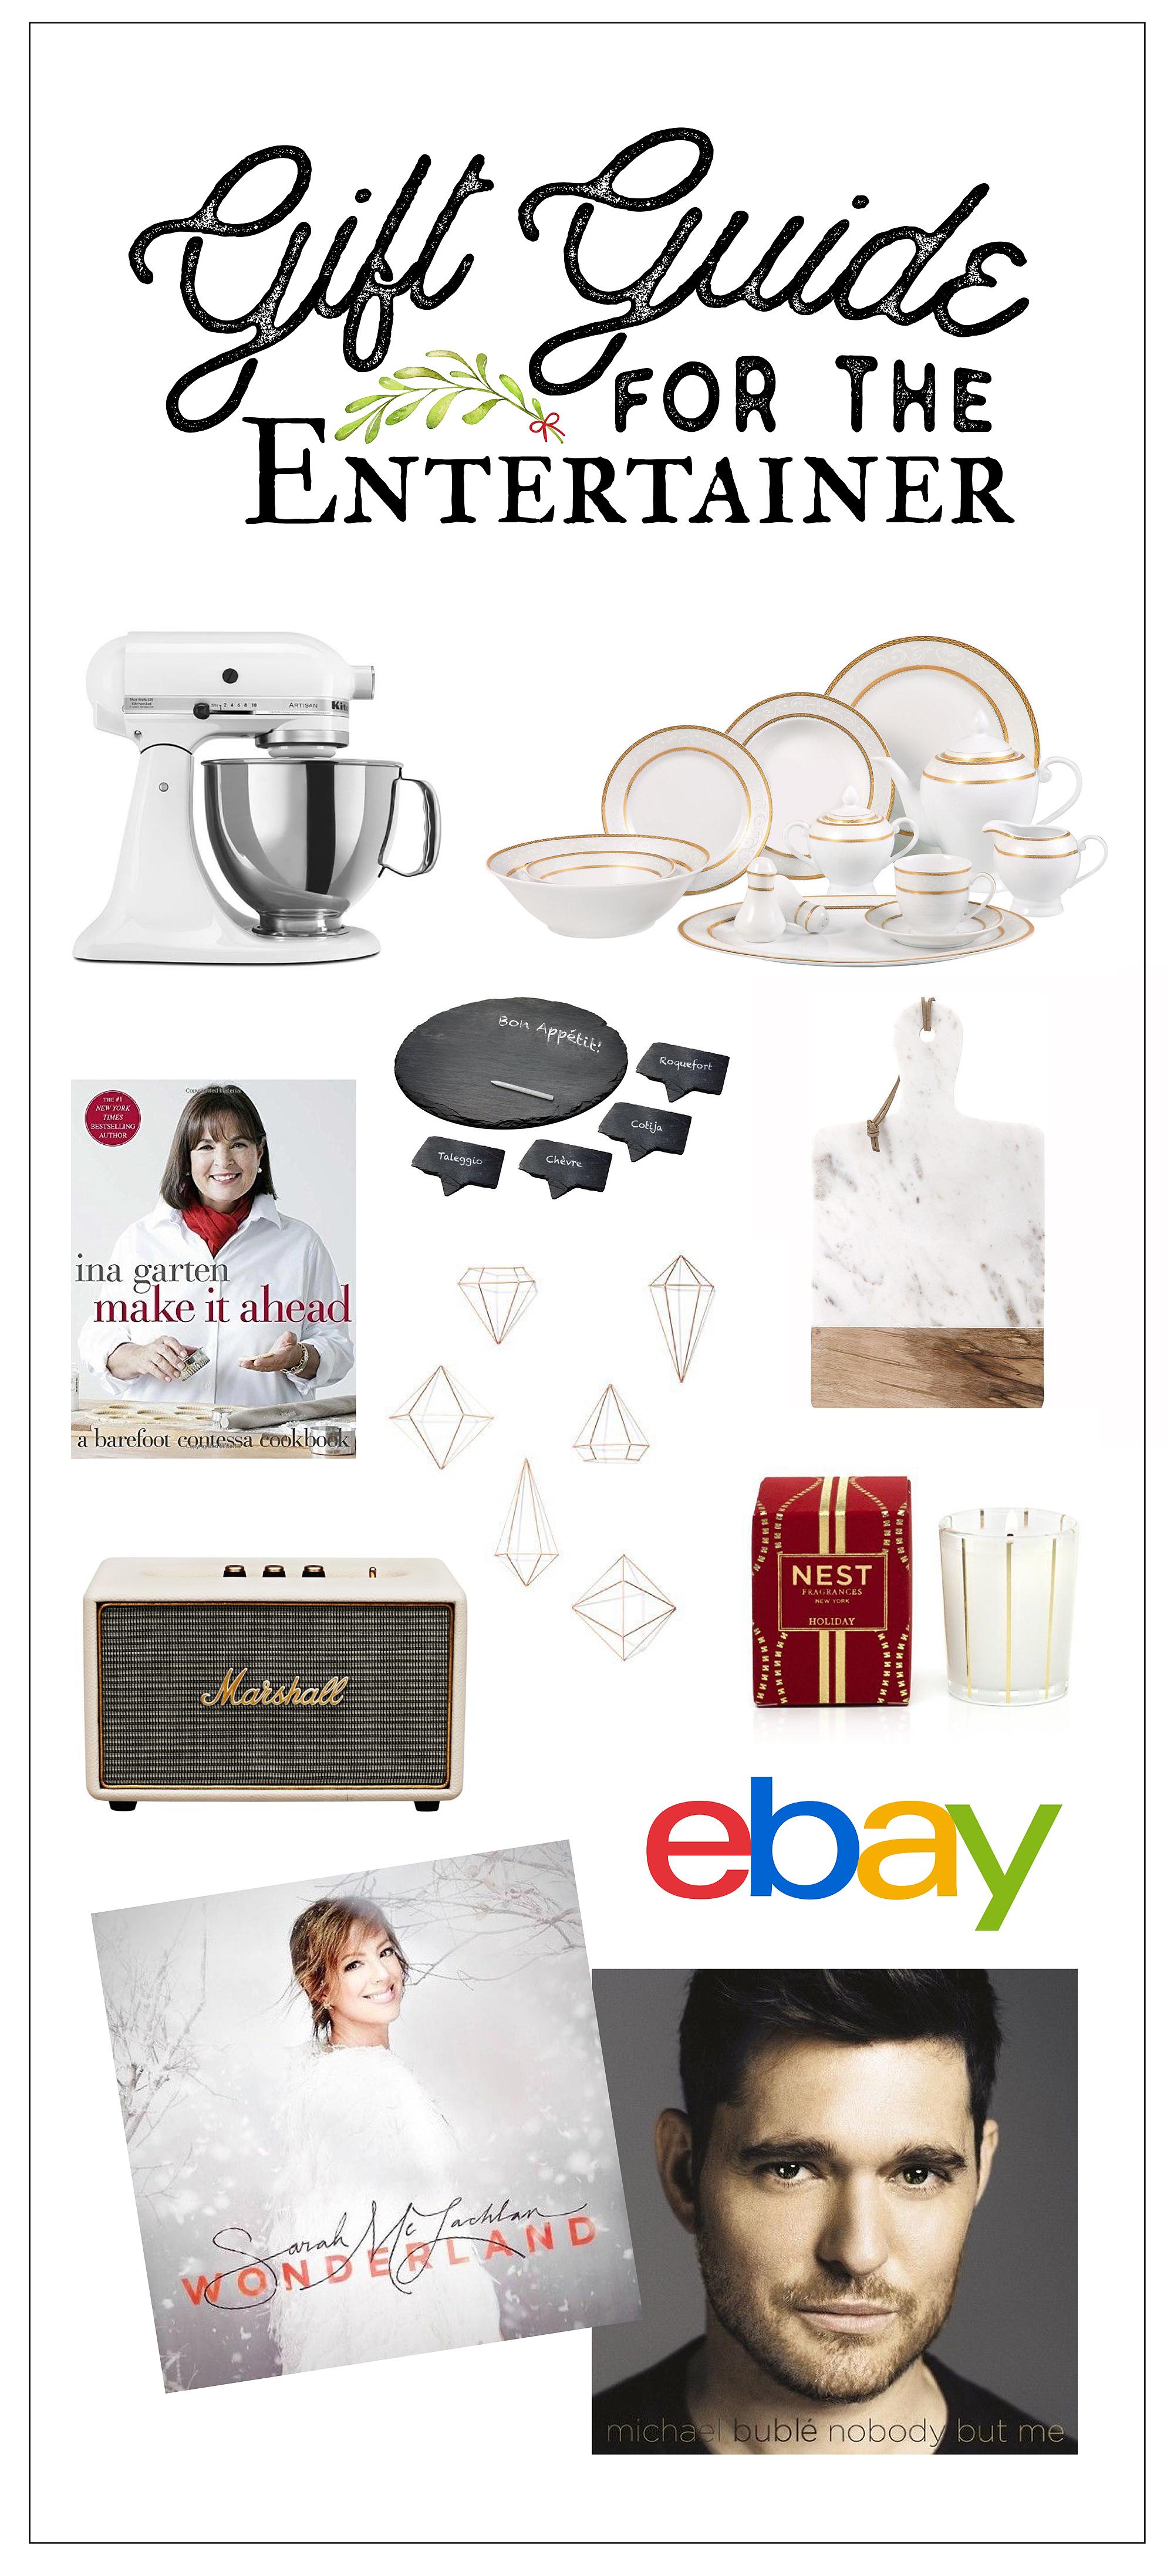 Gift Giving for the Entertainer on eBay